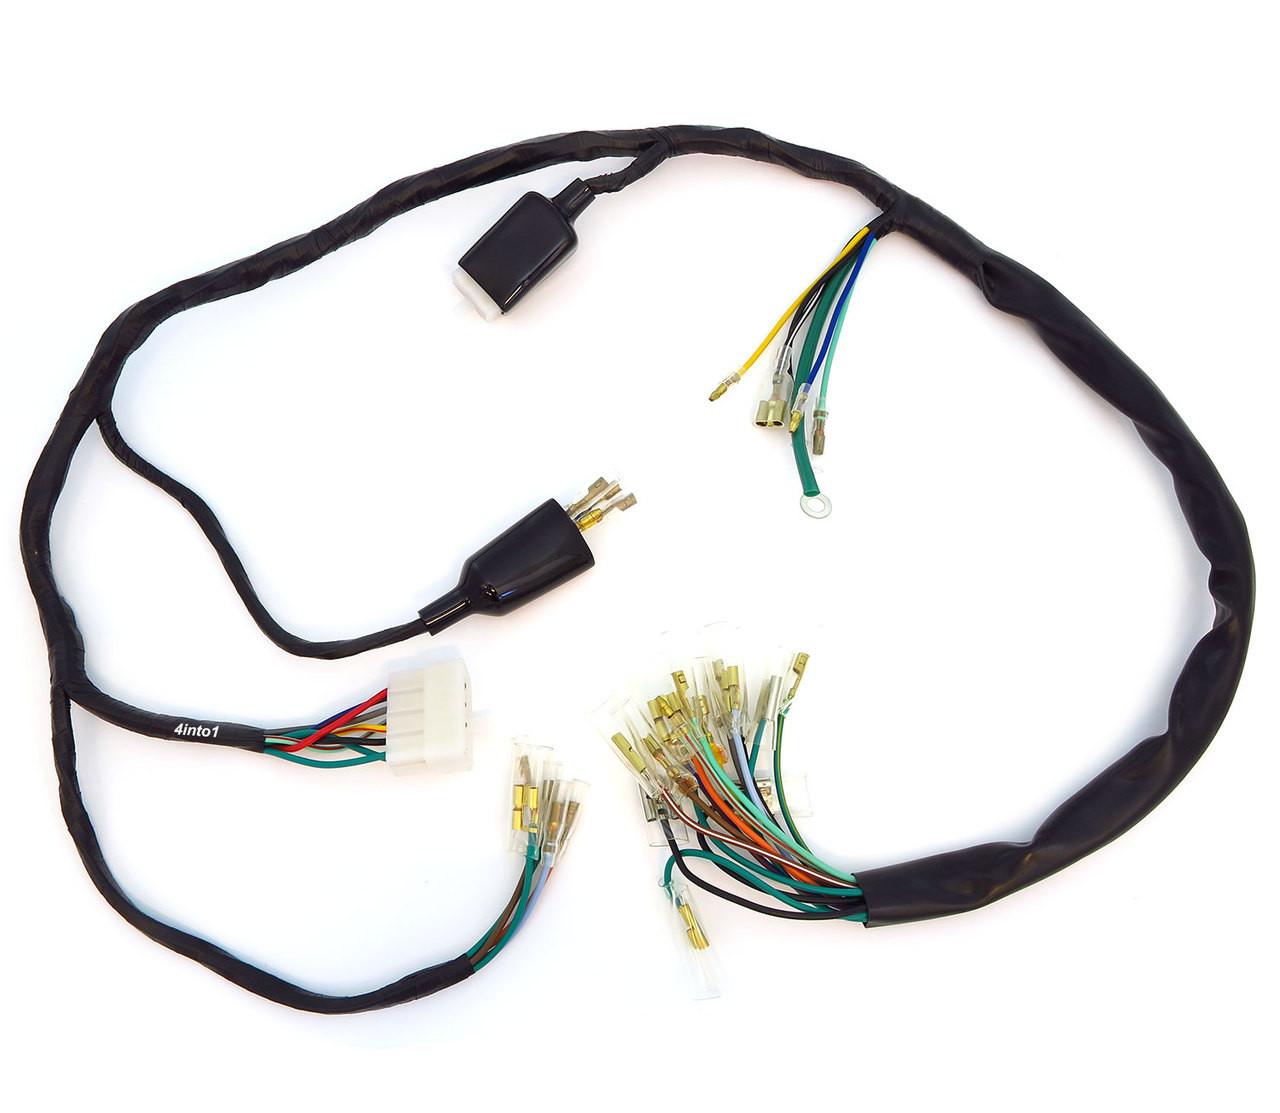 medium resolution of main wiring harness 32100 323 040 honda cb500k 1972 1973 honda wiring harness connectors honda wiring harness